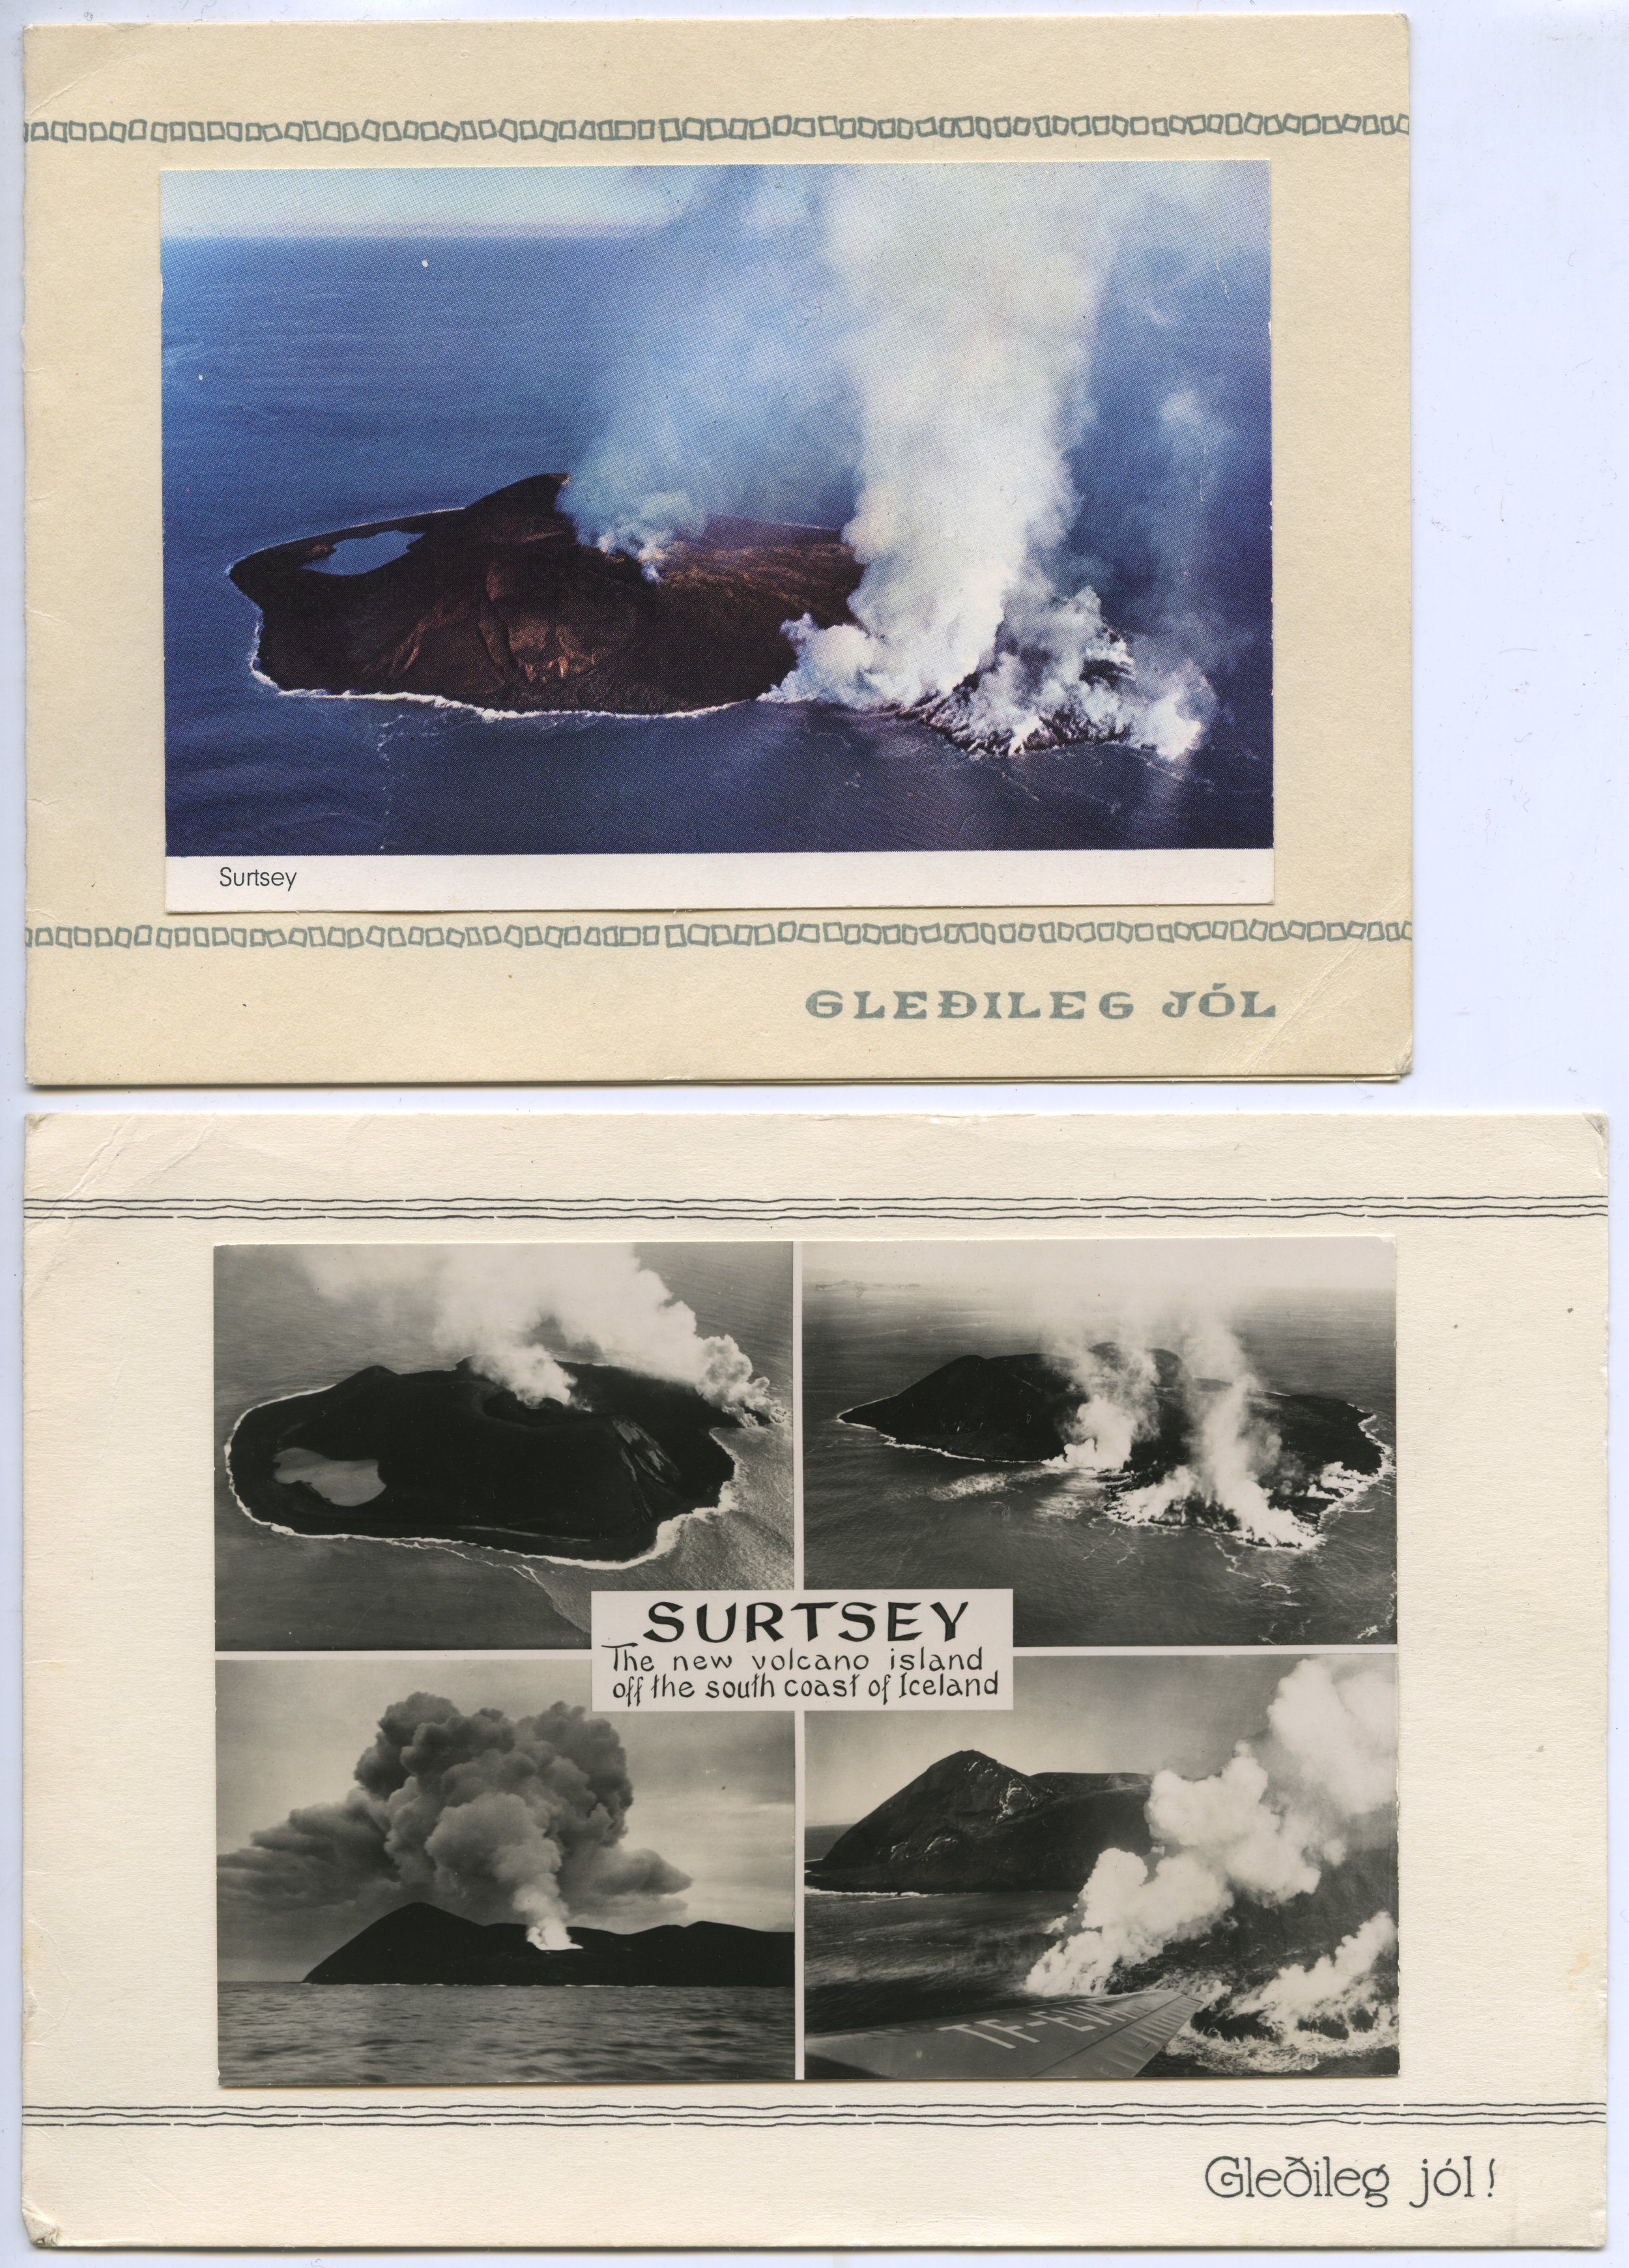 surtsey postcards.jpeg